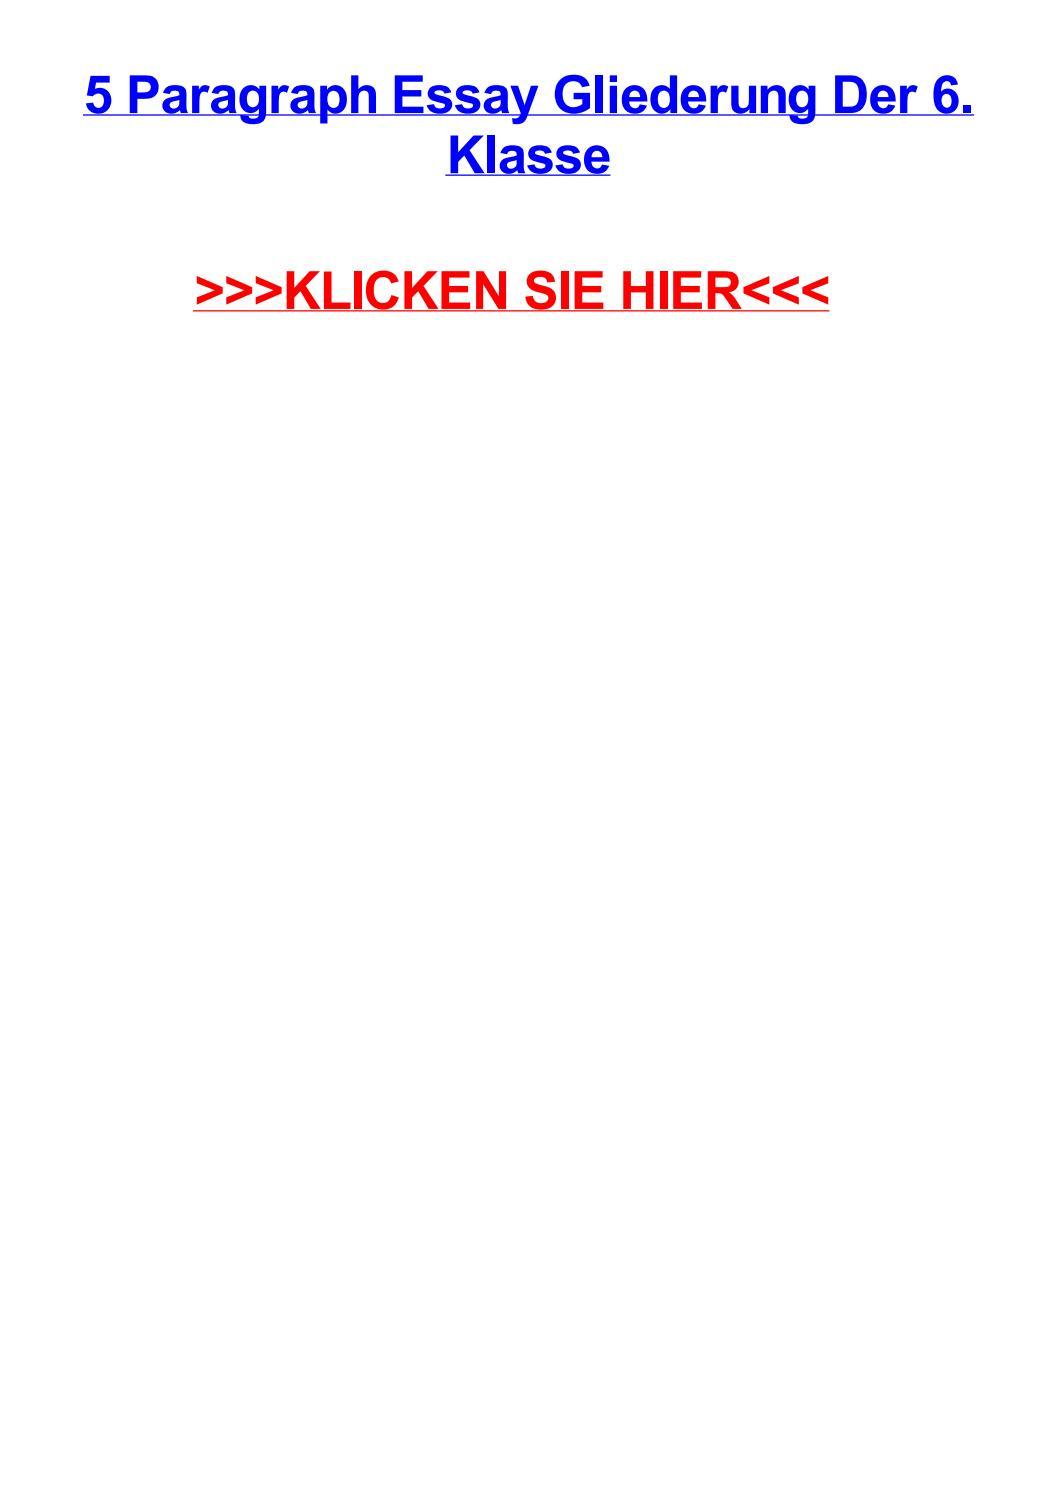 Wunderbar Hindi Grammatik Arbeitsblatt Für Die Klasse 6 Ideen ...